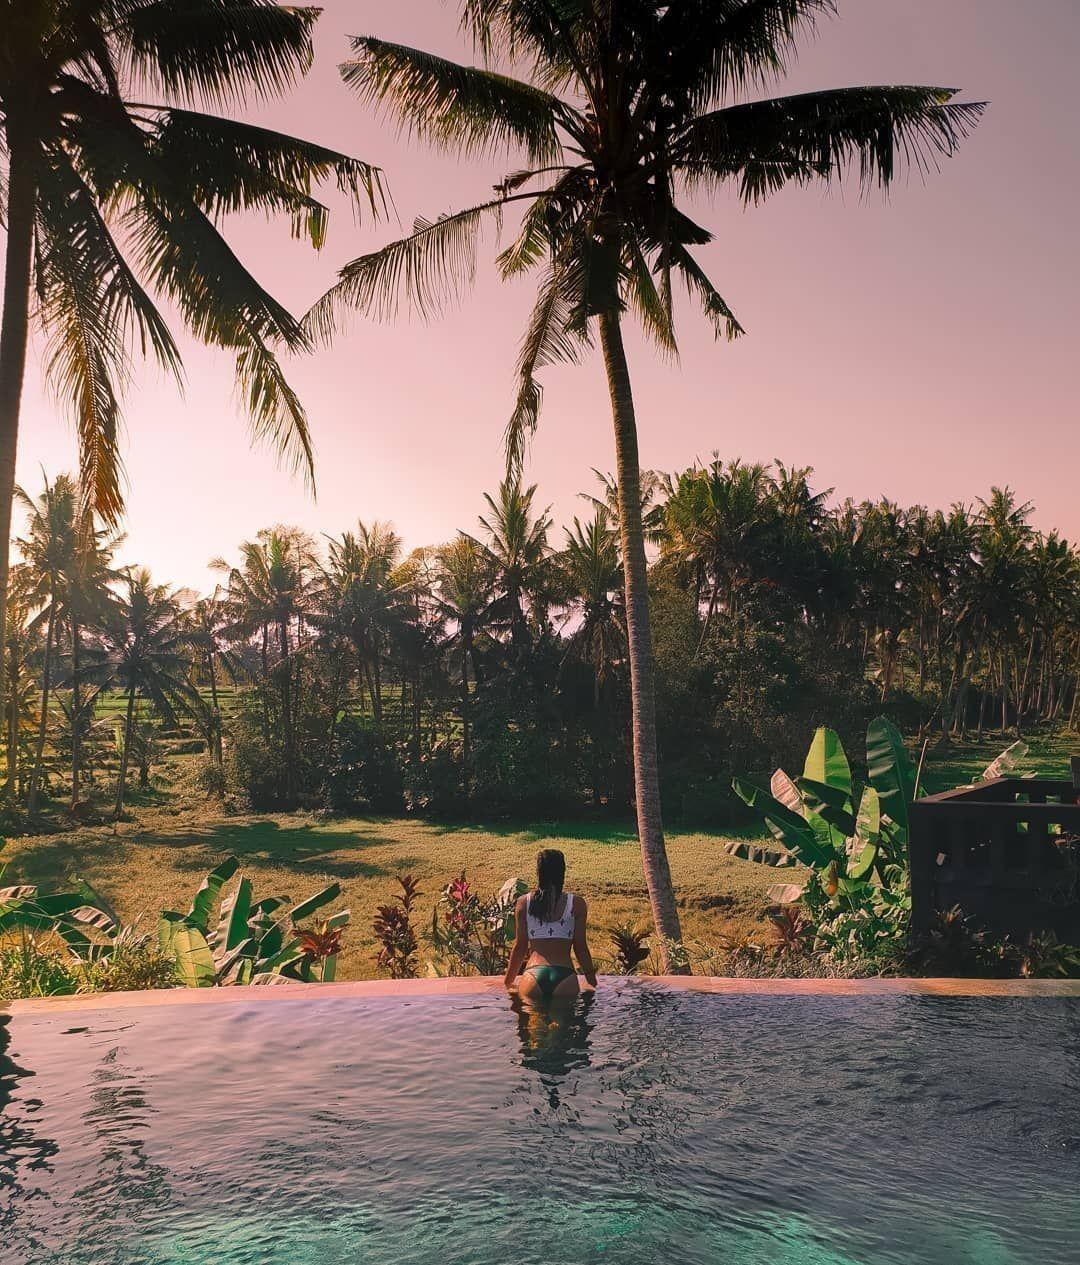 Staying at Agung Raka Resort & Villa,  Enjoy A Luxury Experience in Ubud